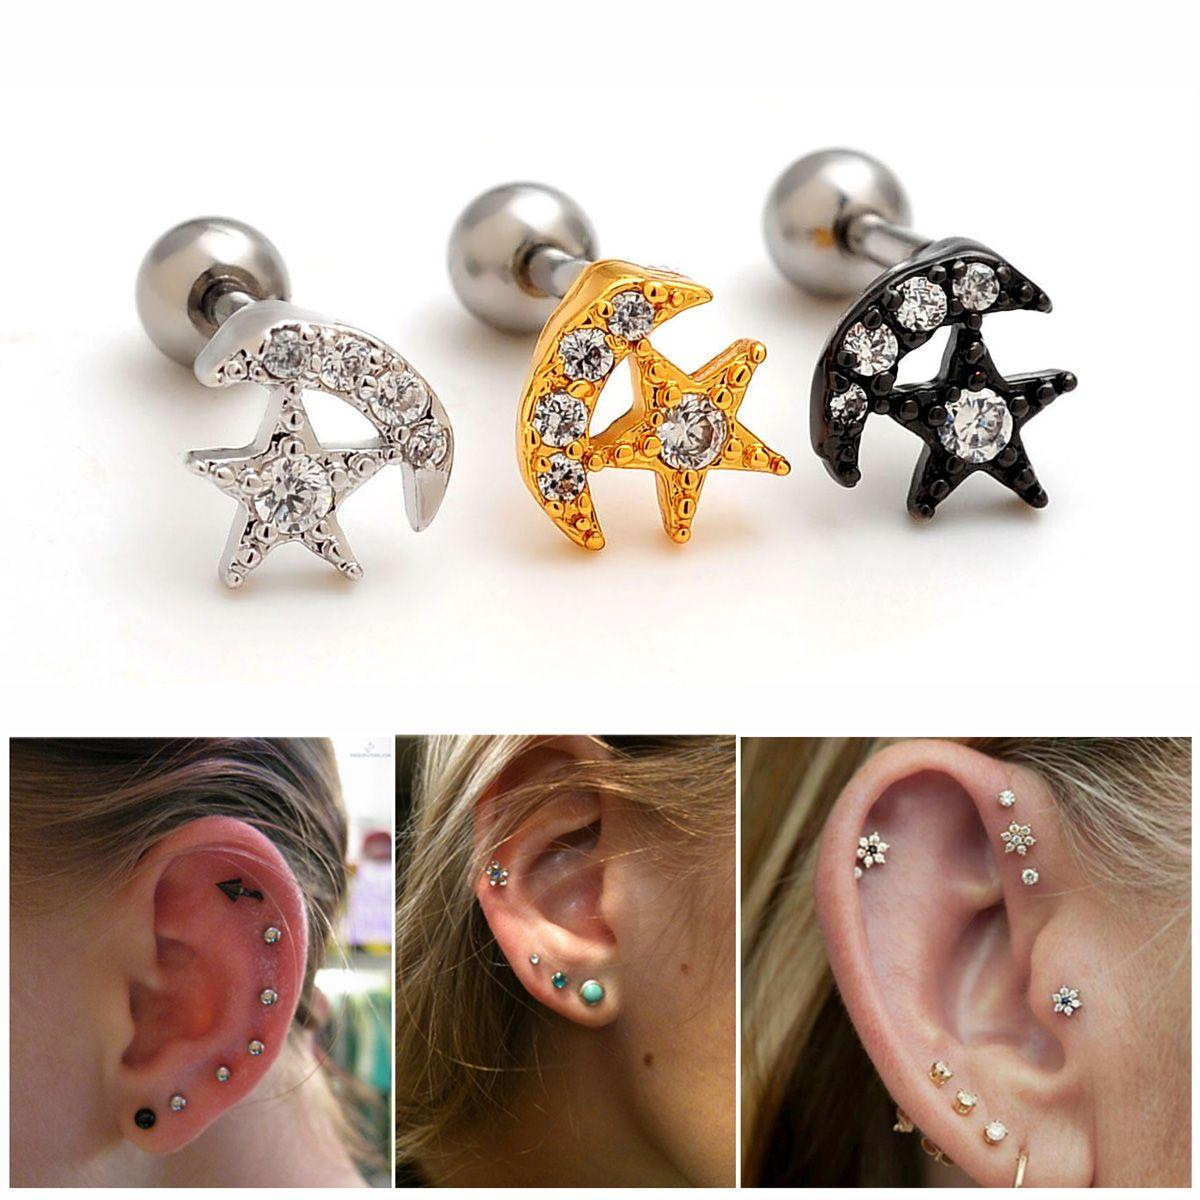 2pcs 16g Moon Star Ear Studs Cartilage Earrings Tragus Helix Piercing 16  Gauges